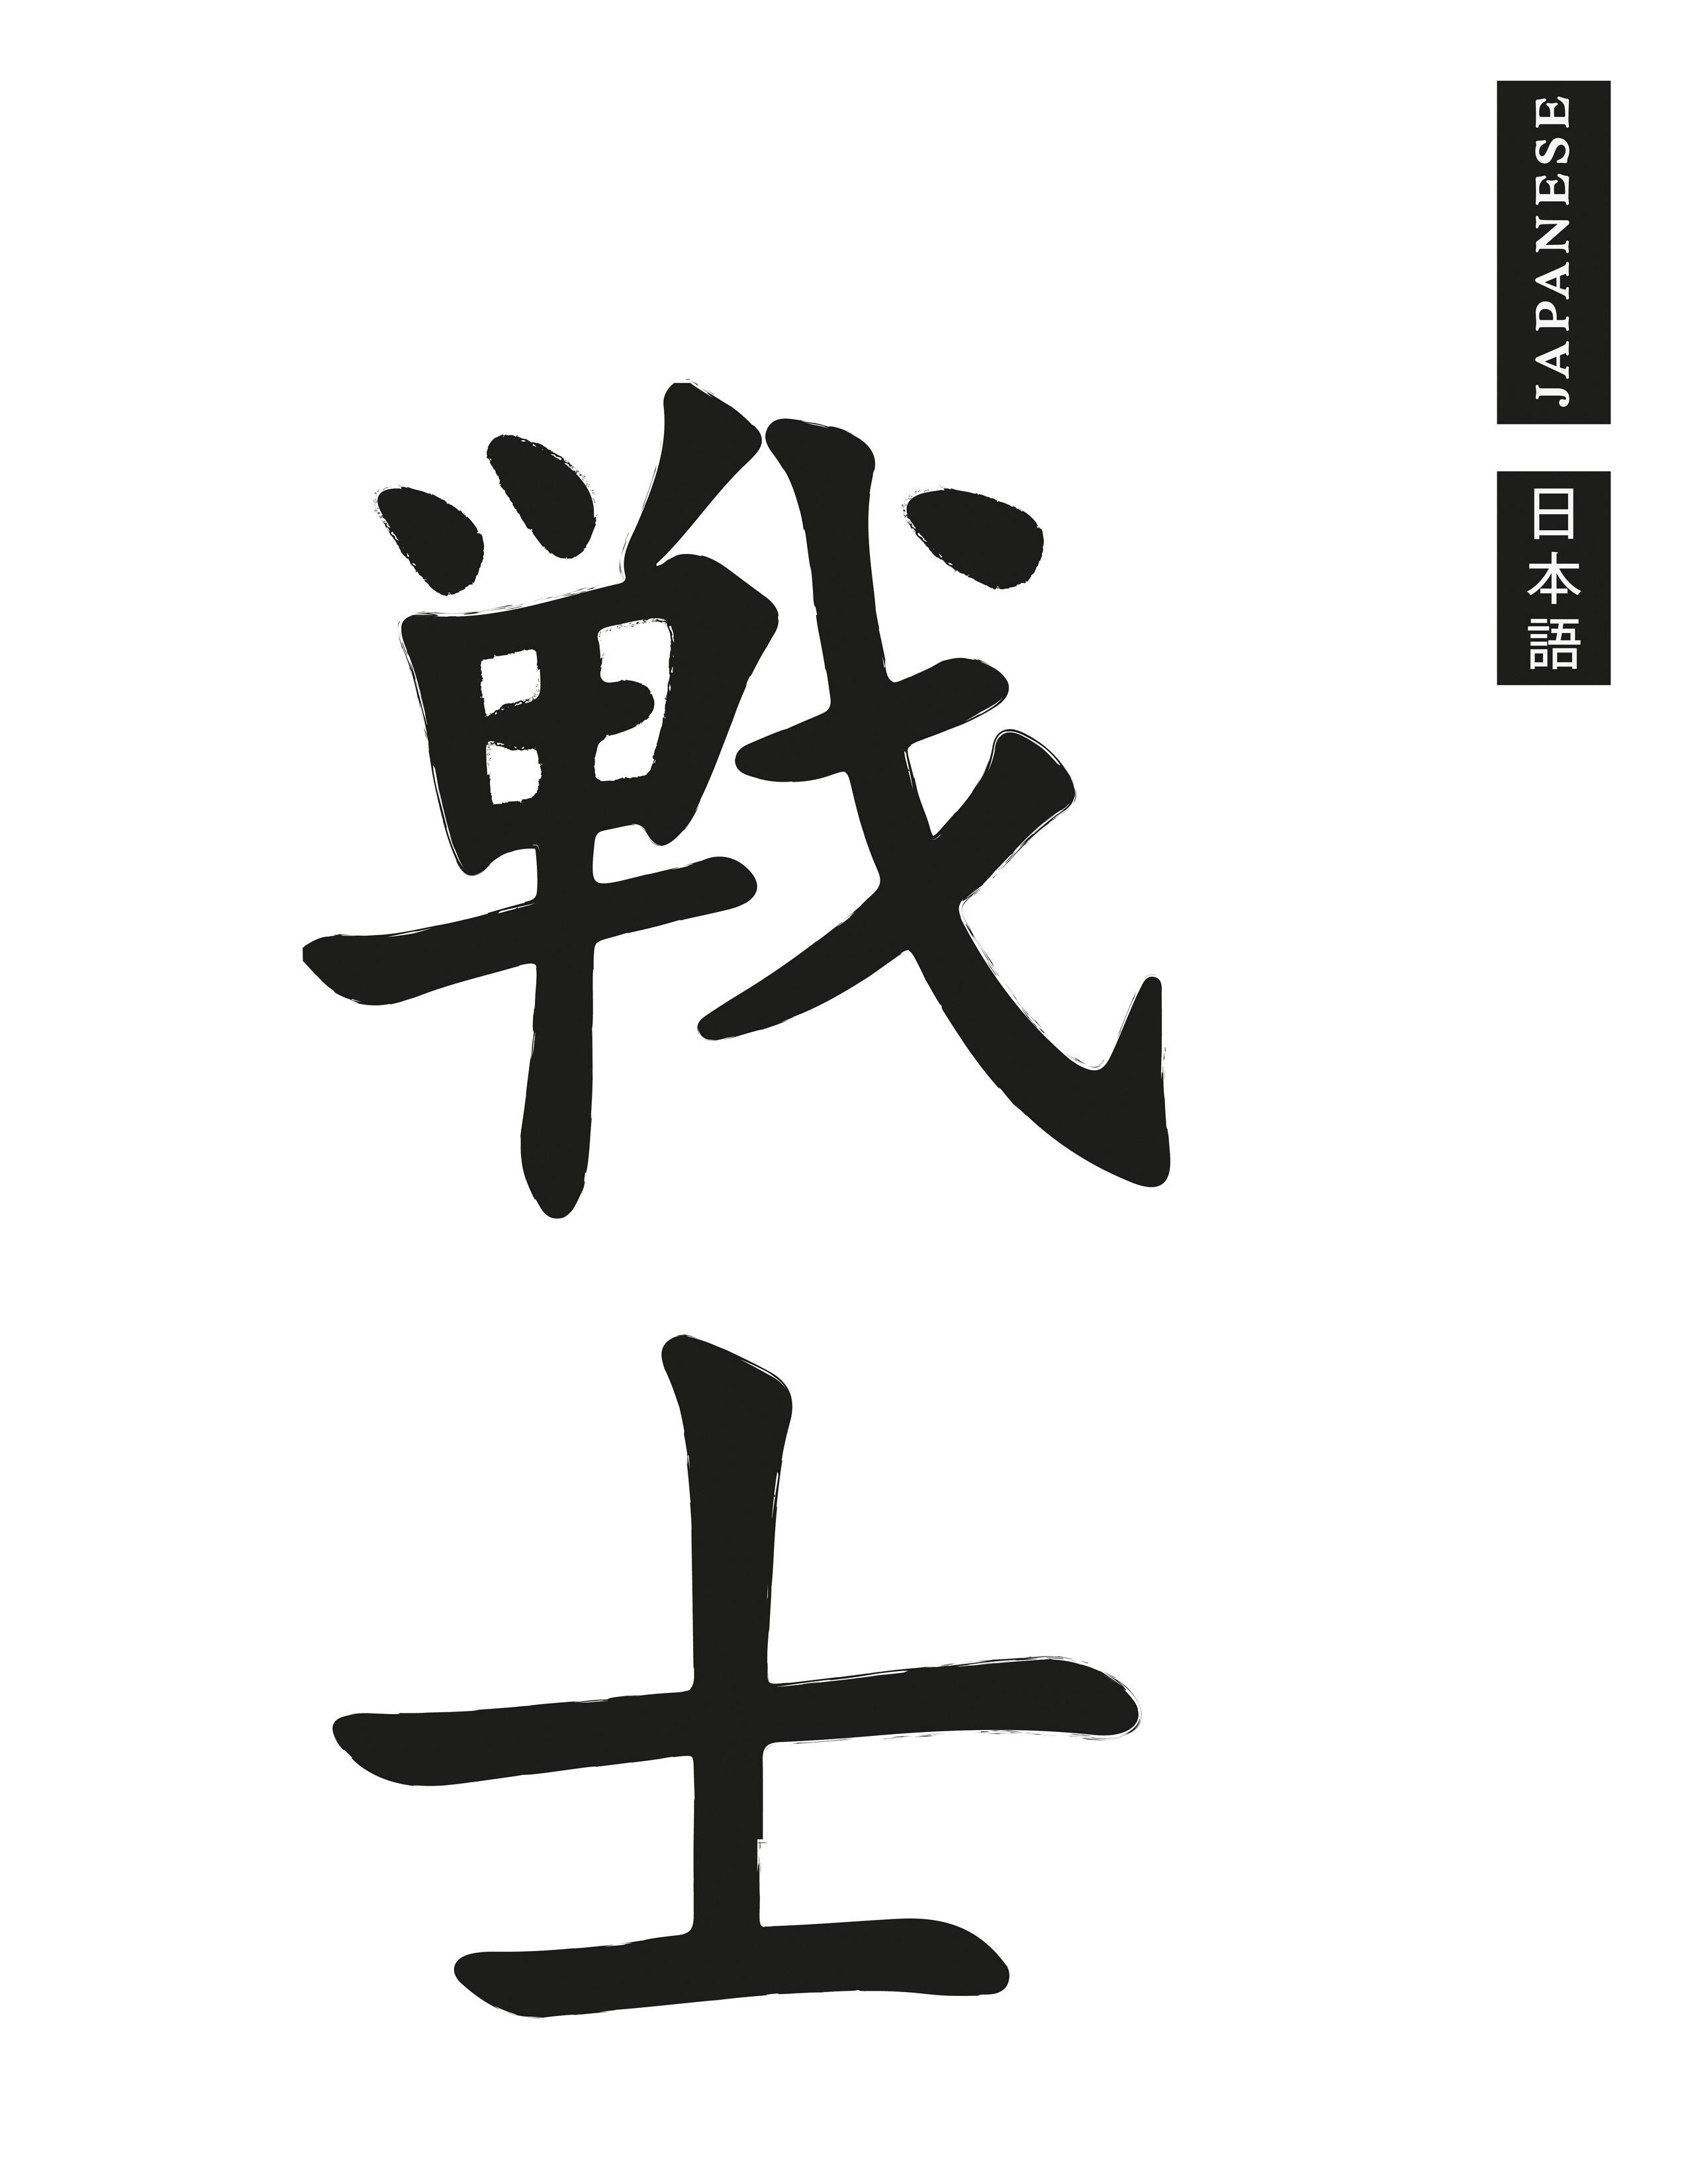 WARRIOR Kanji Japanese Vinyl Graphic Decal Car Bumper Sticker Chinese